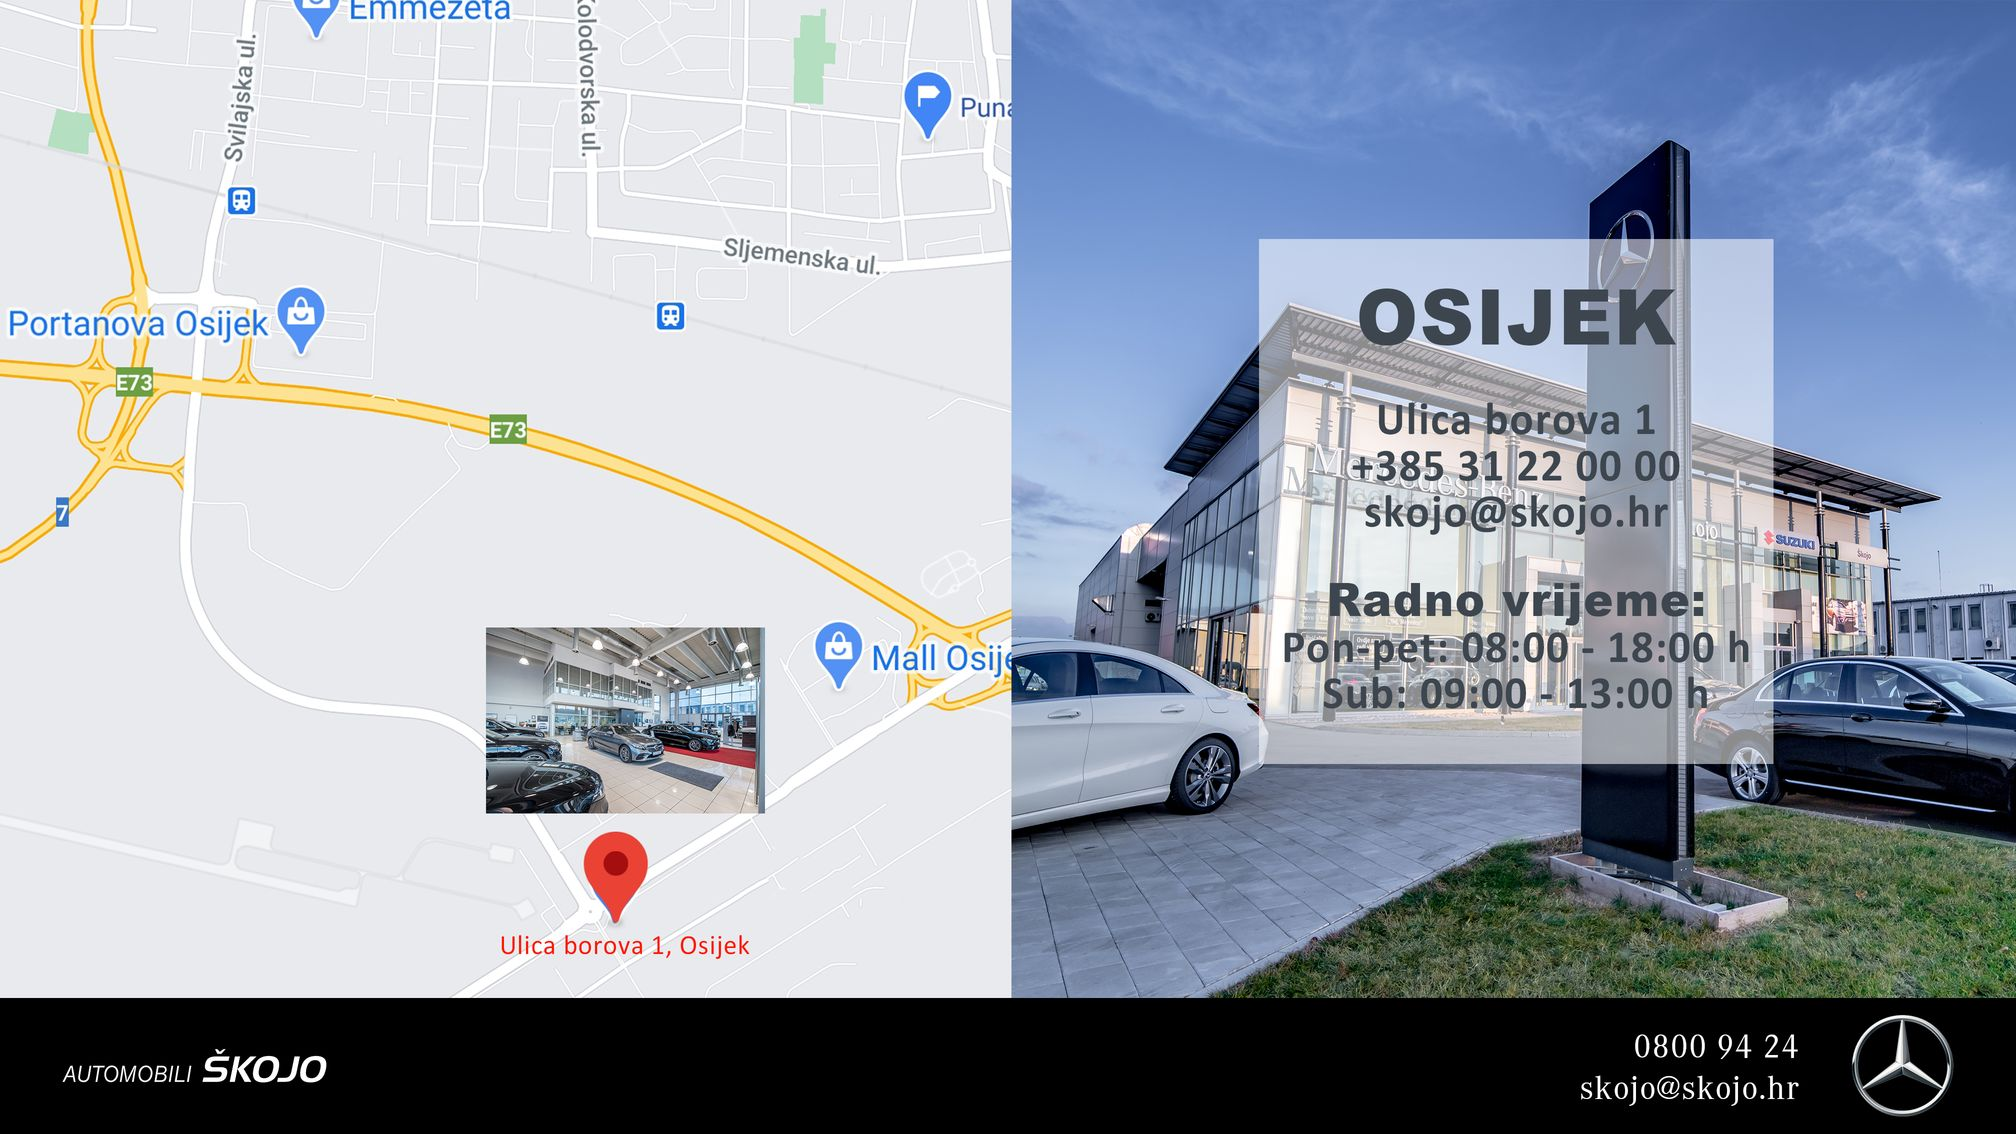 2. OS_MB_lokacija